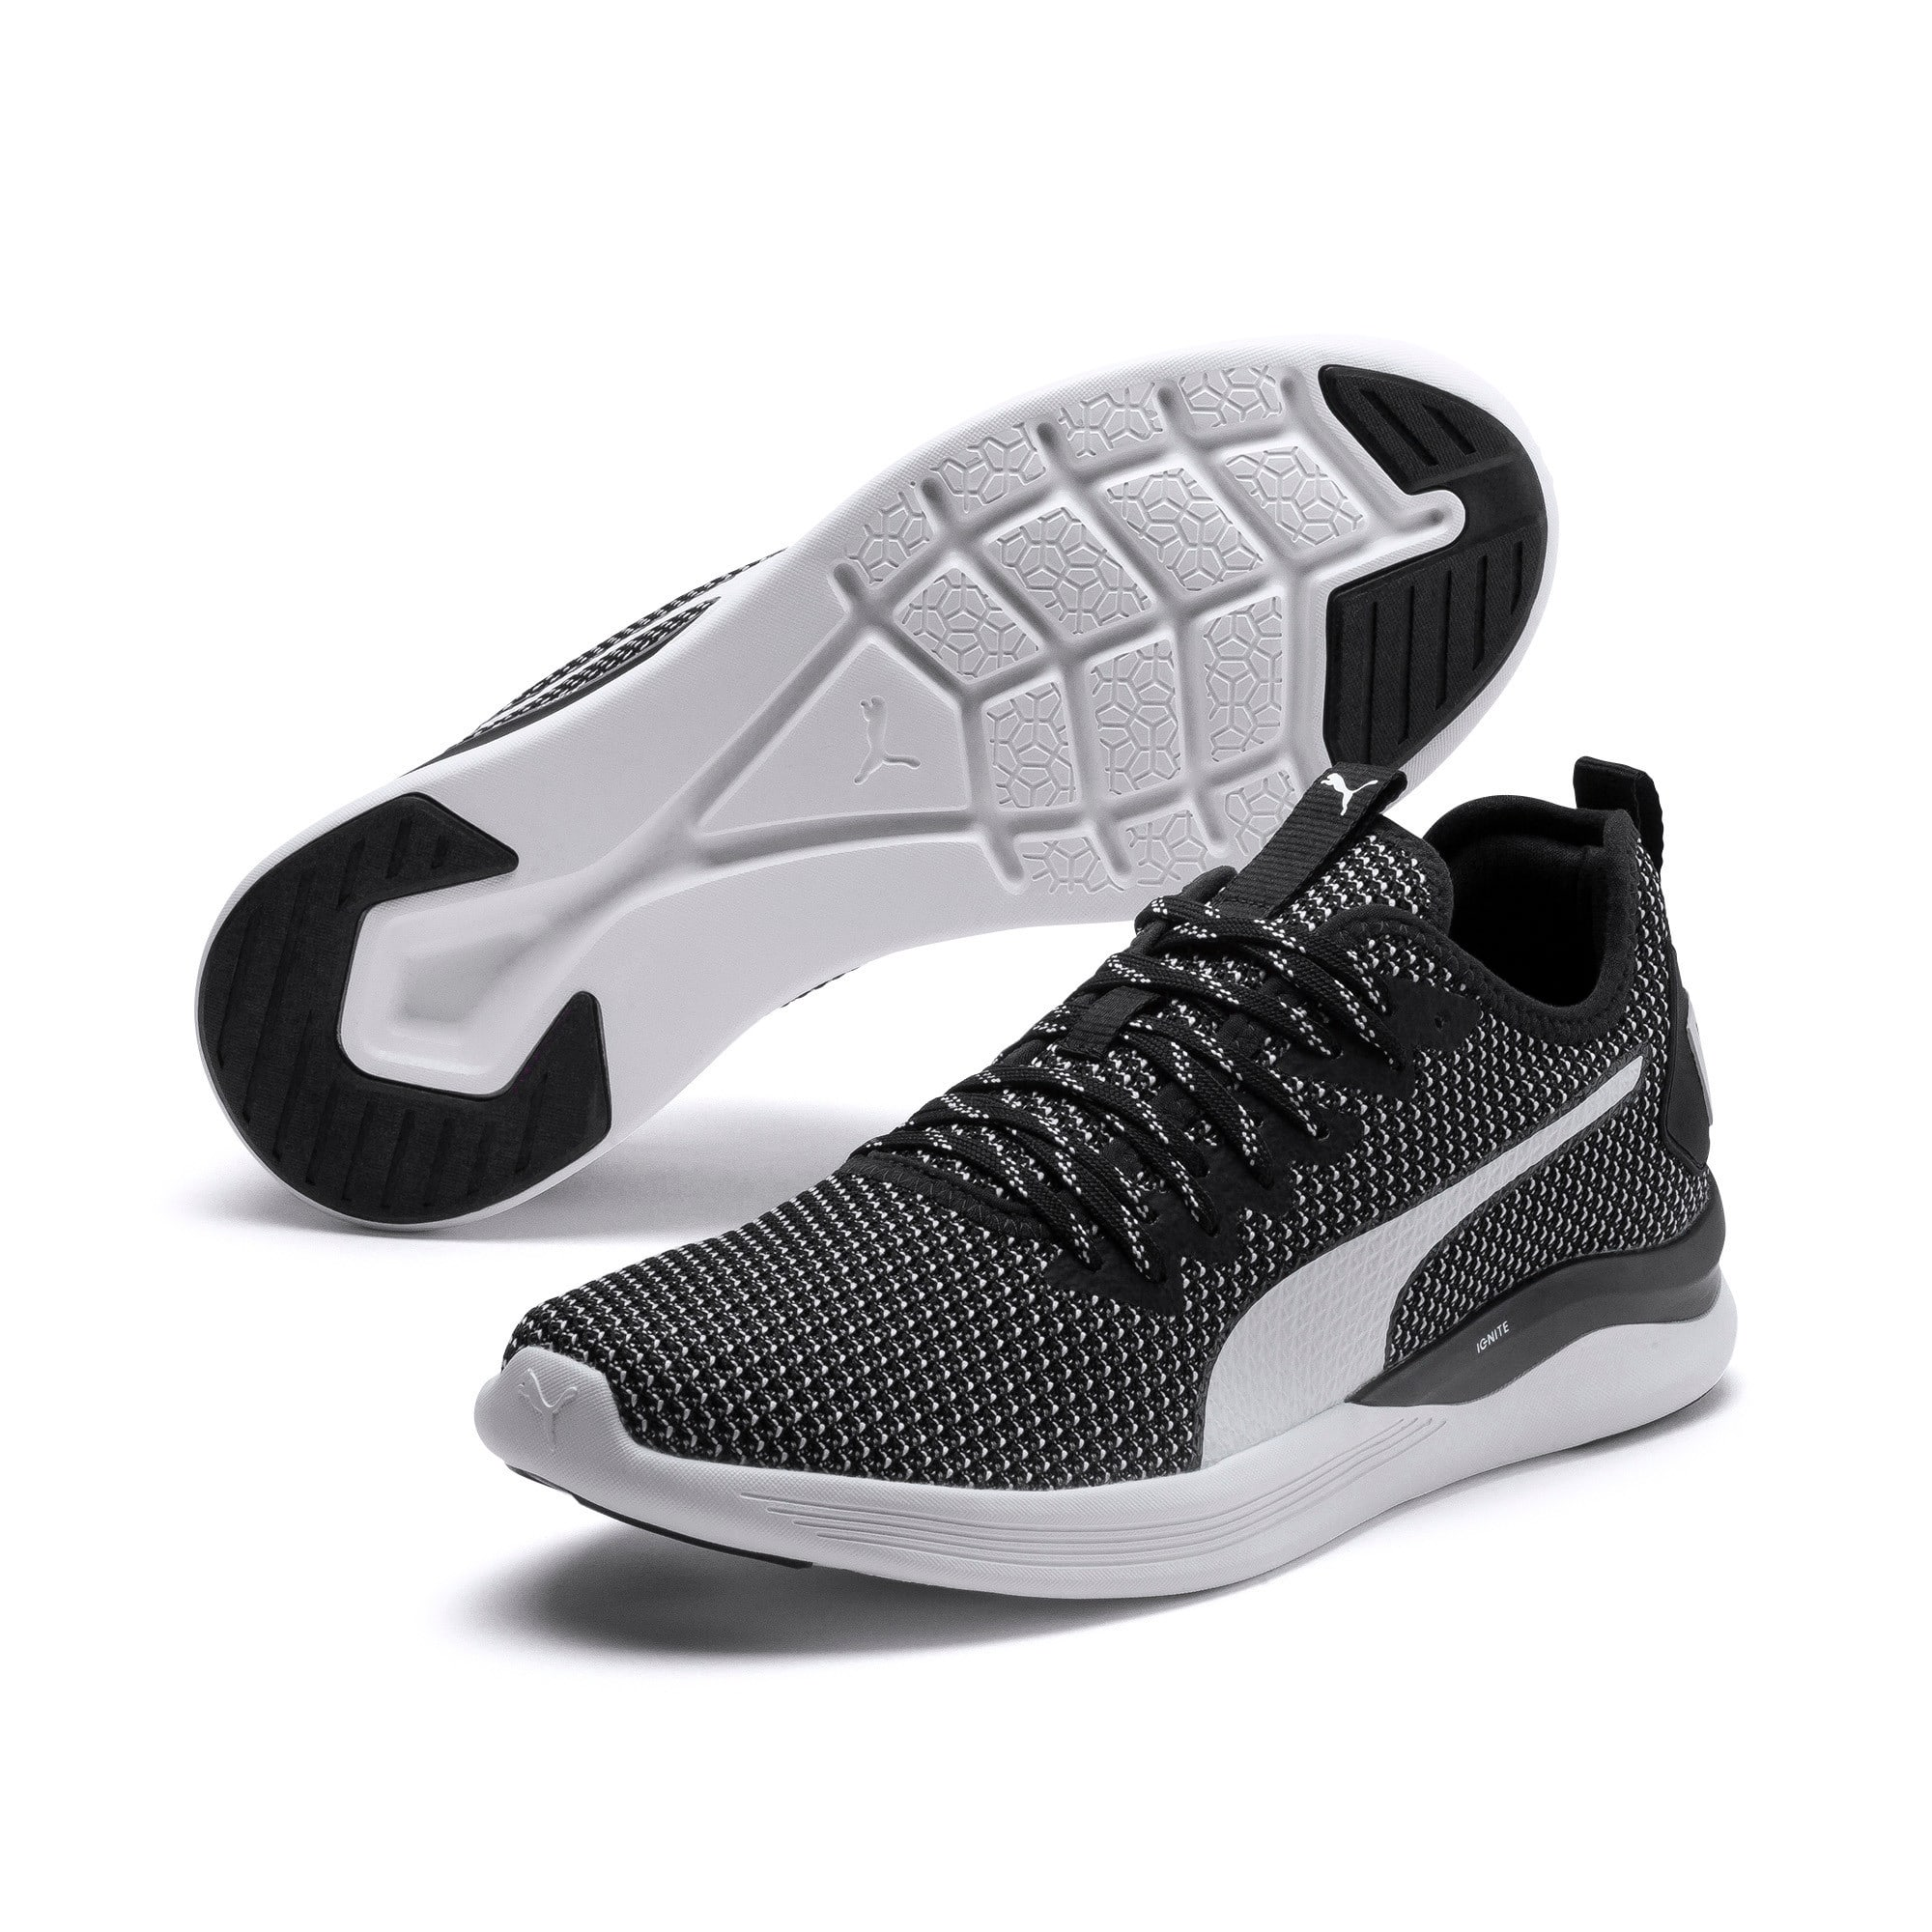 Thumbnail 2 of IGNITE Flash FS Men's Running Shoes, Puma Black-Puma White, medium